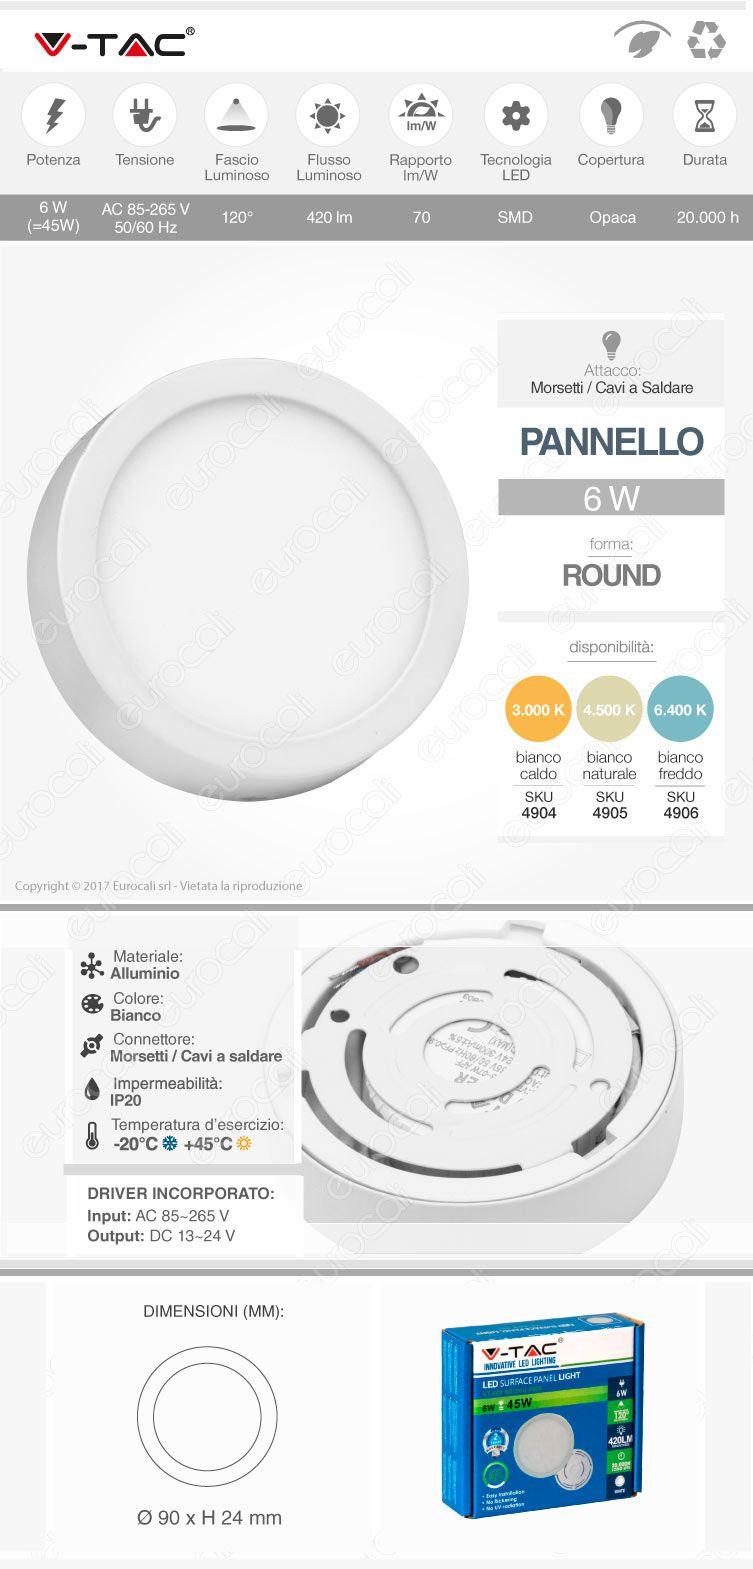 Pannello LED V-Tac